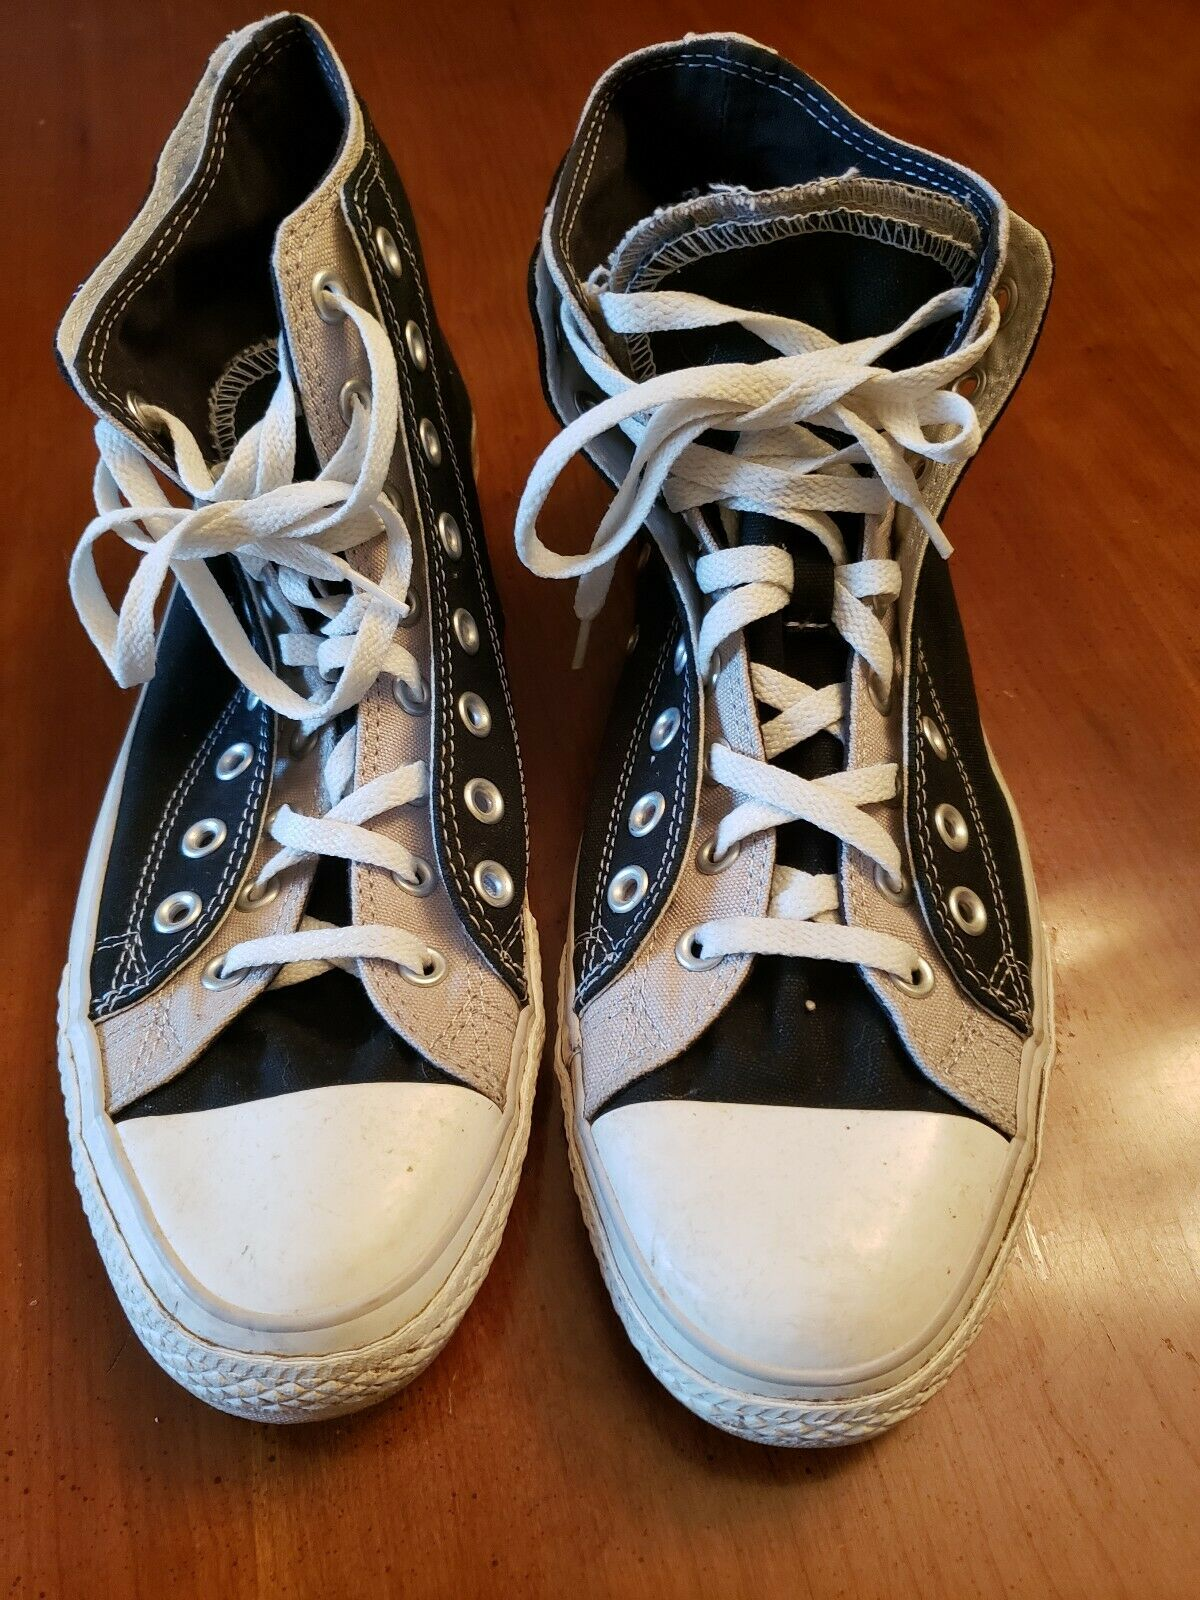 Converse Chuck Taylor All Star High Top Tennis shoes Black Grey  Mens 13 105662F